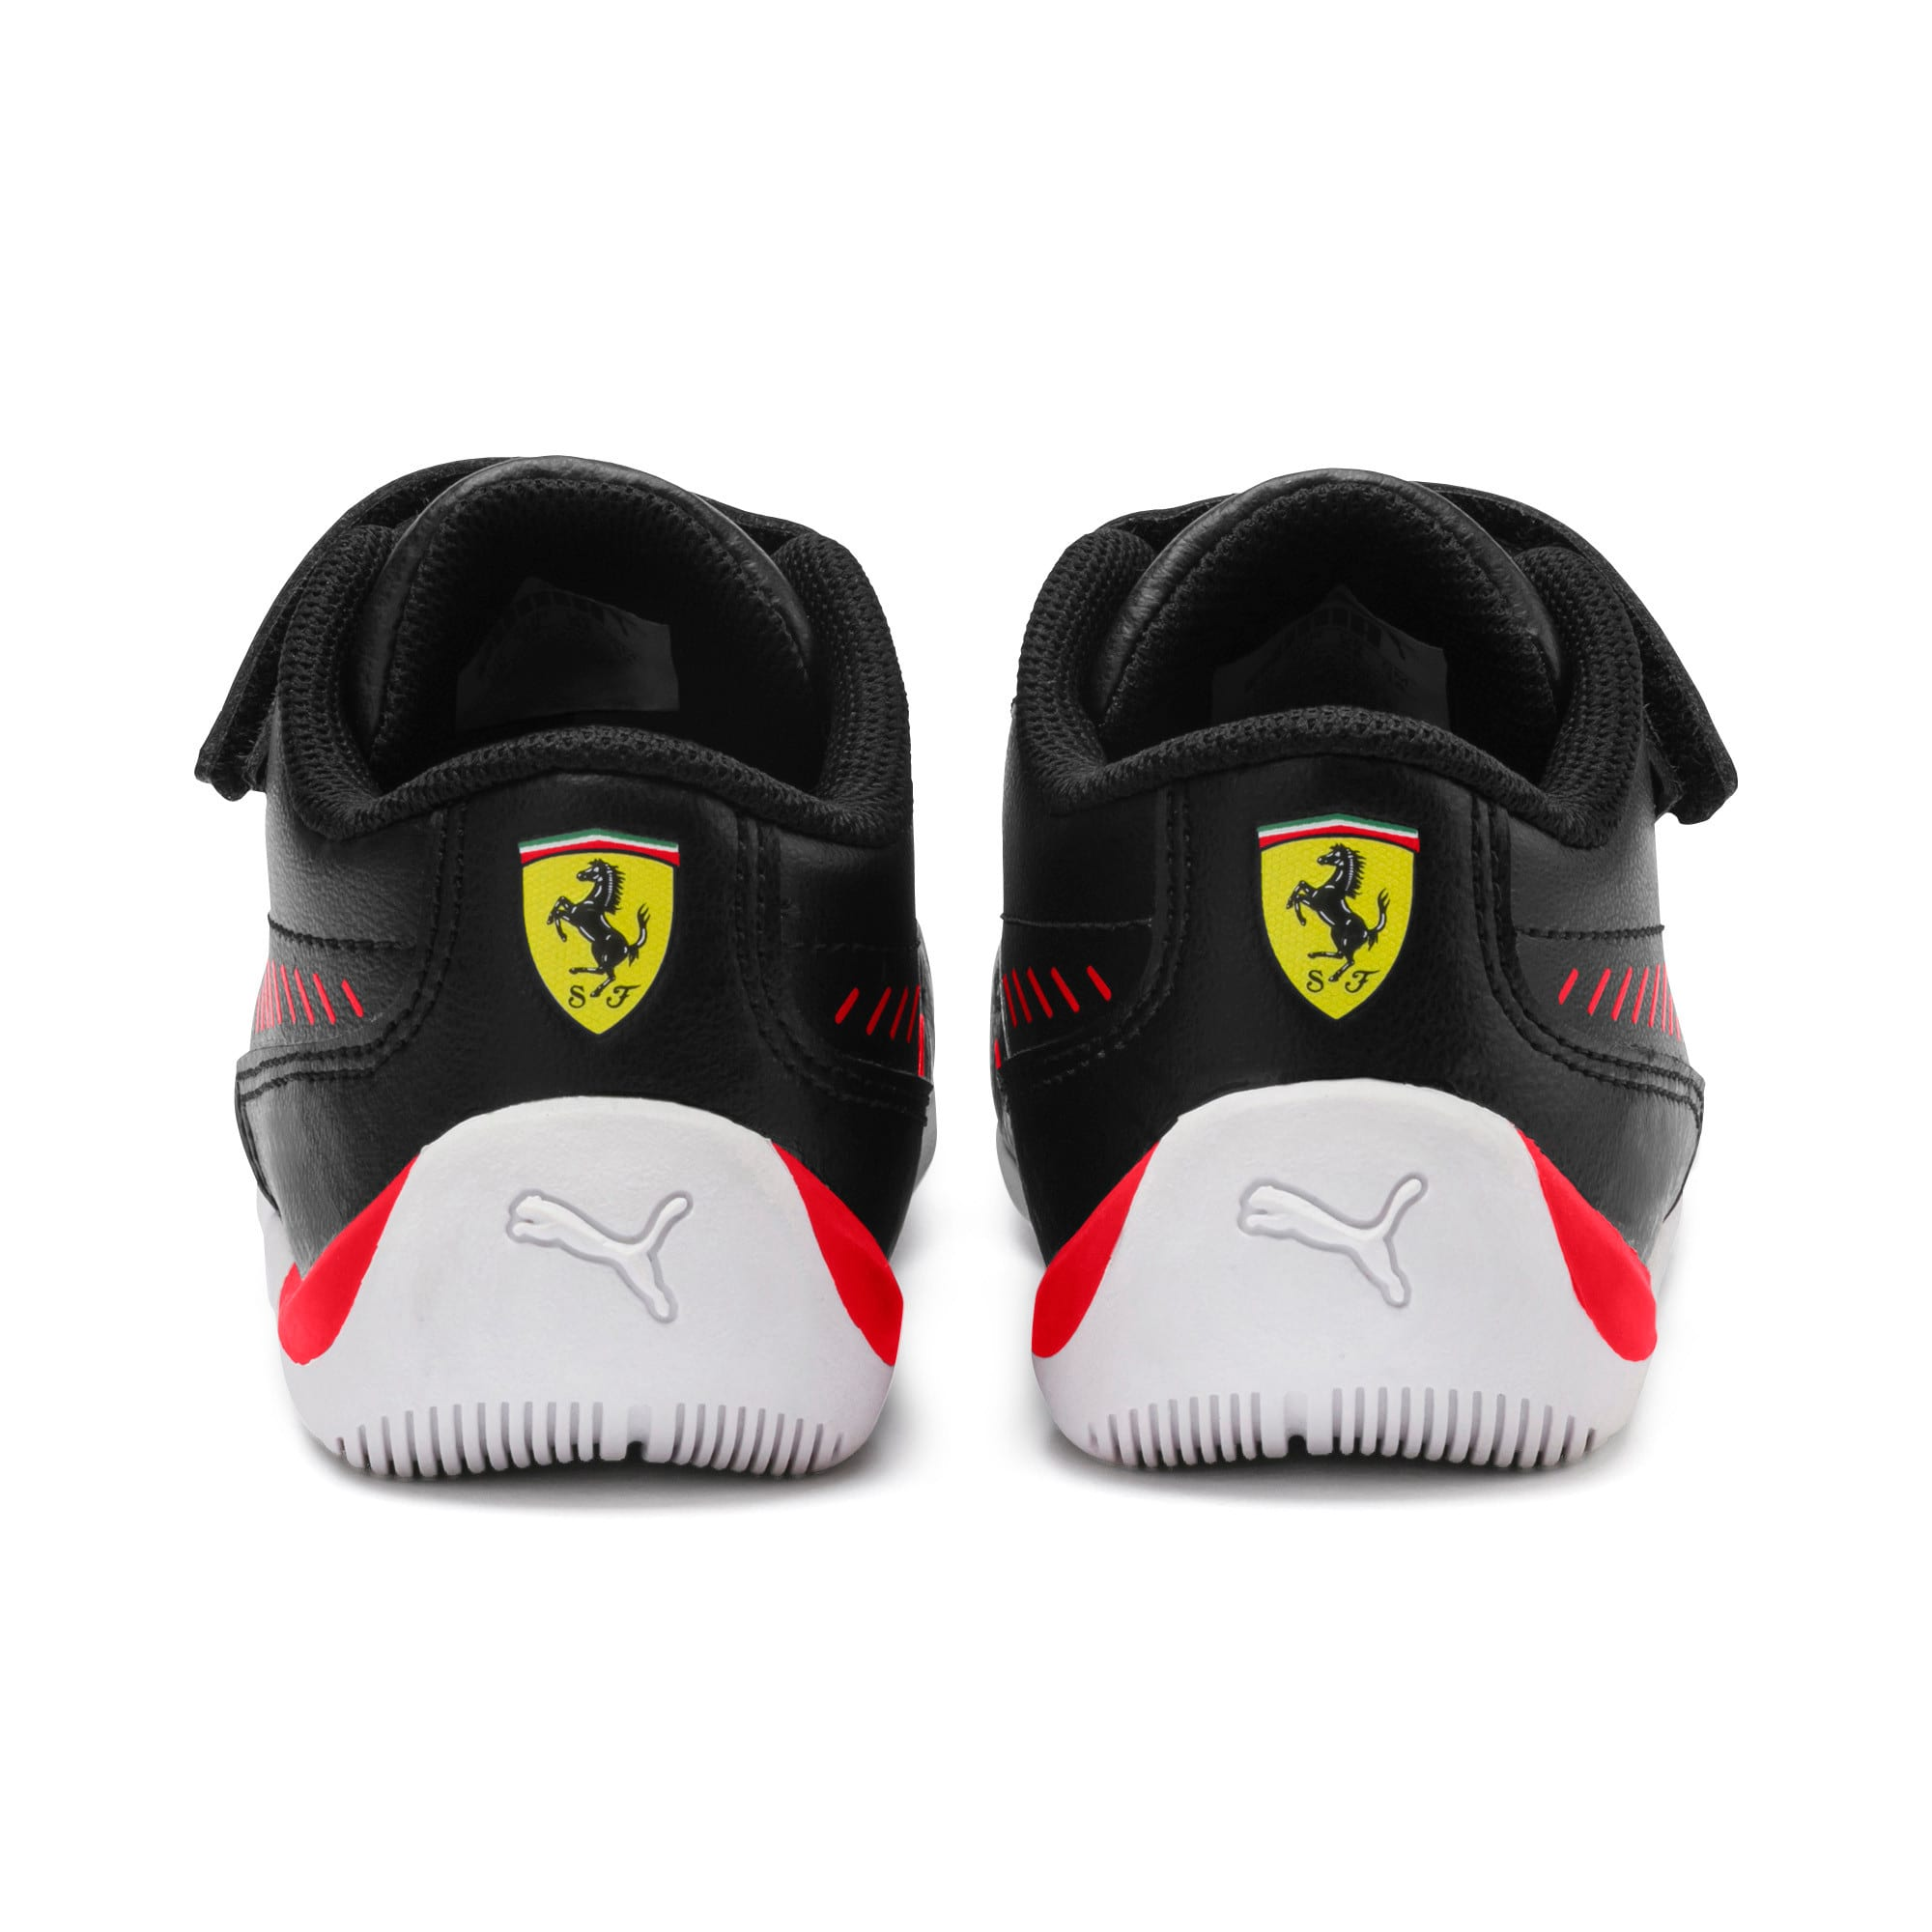 Thumbnail 3 of Ferrari Drift Cat 7S Ultra Kids Sneaker, Puma Black-Rosso Corsa, medium